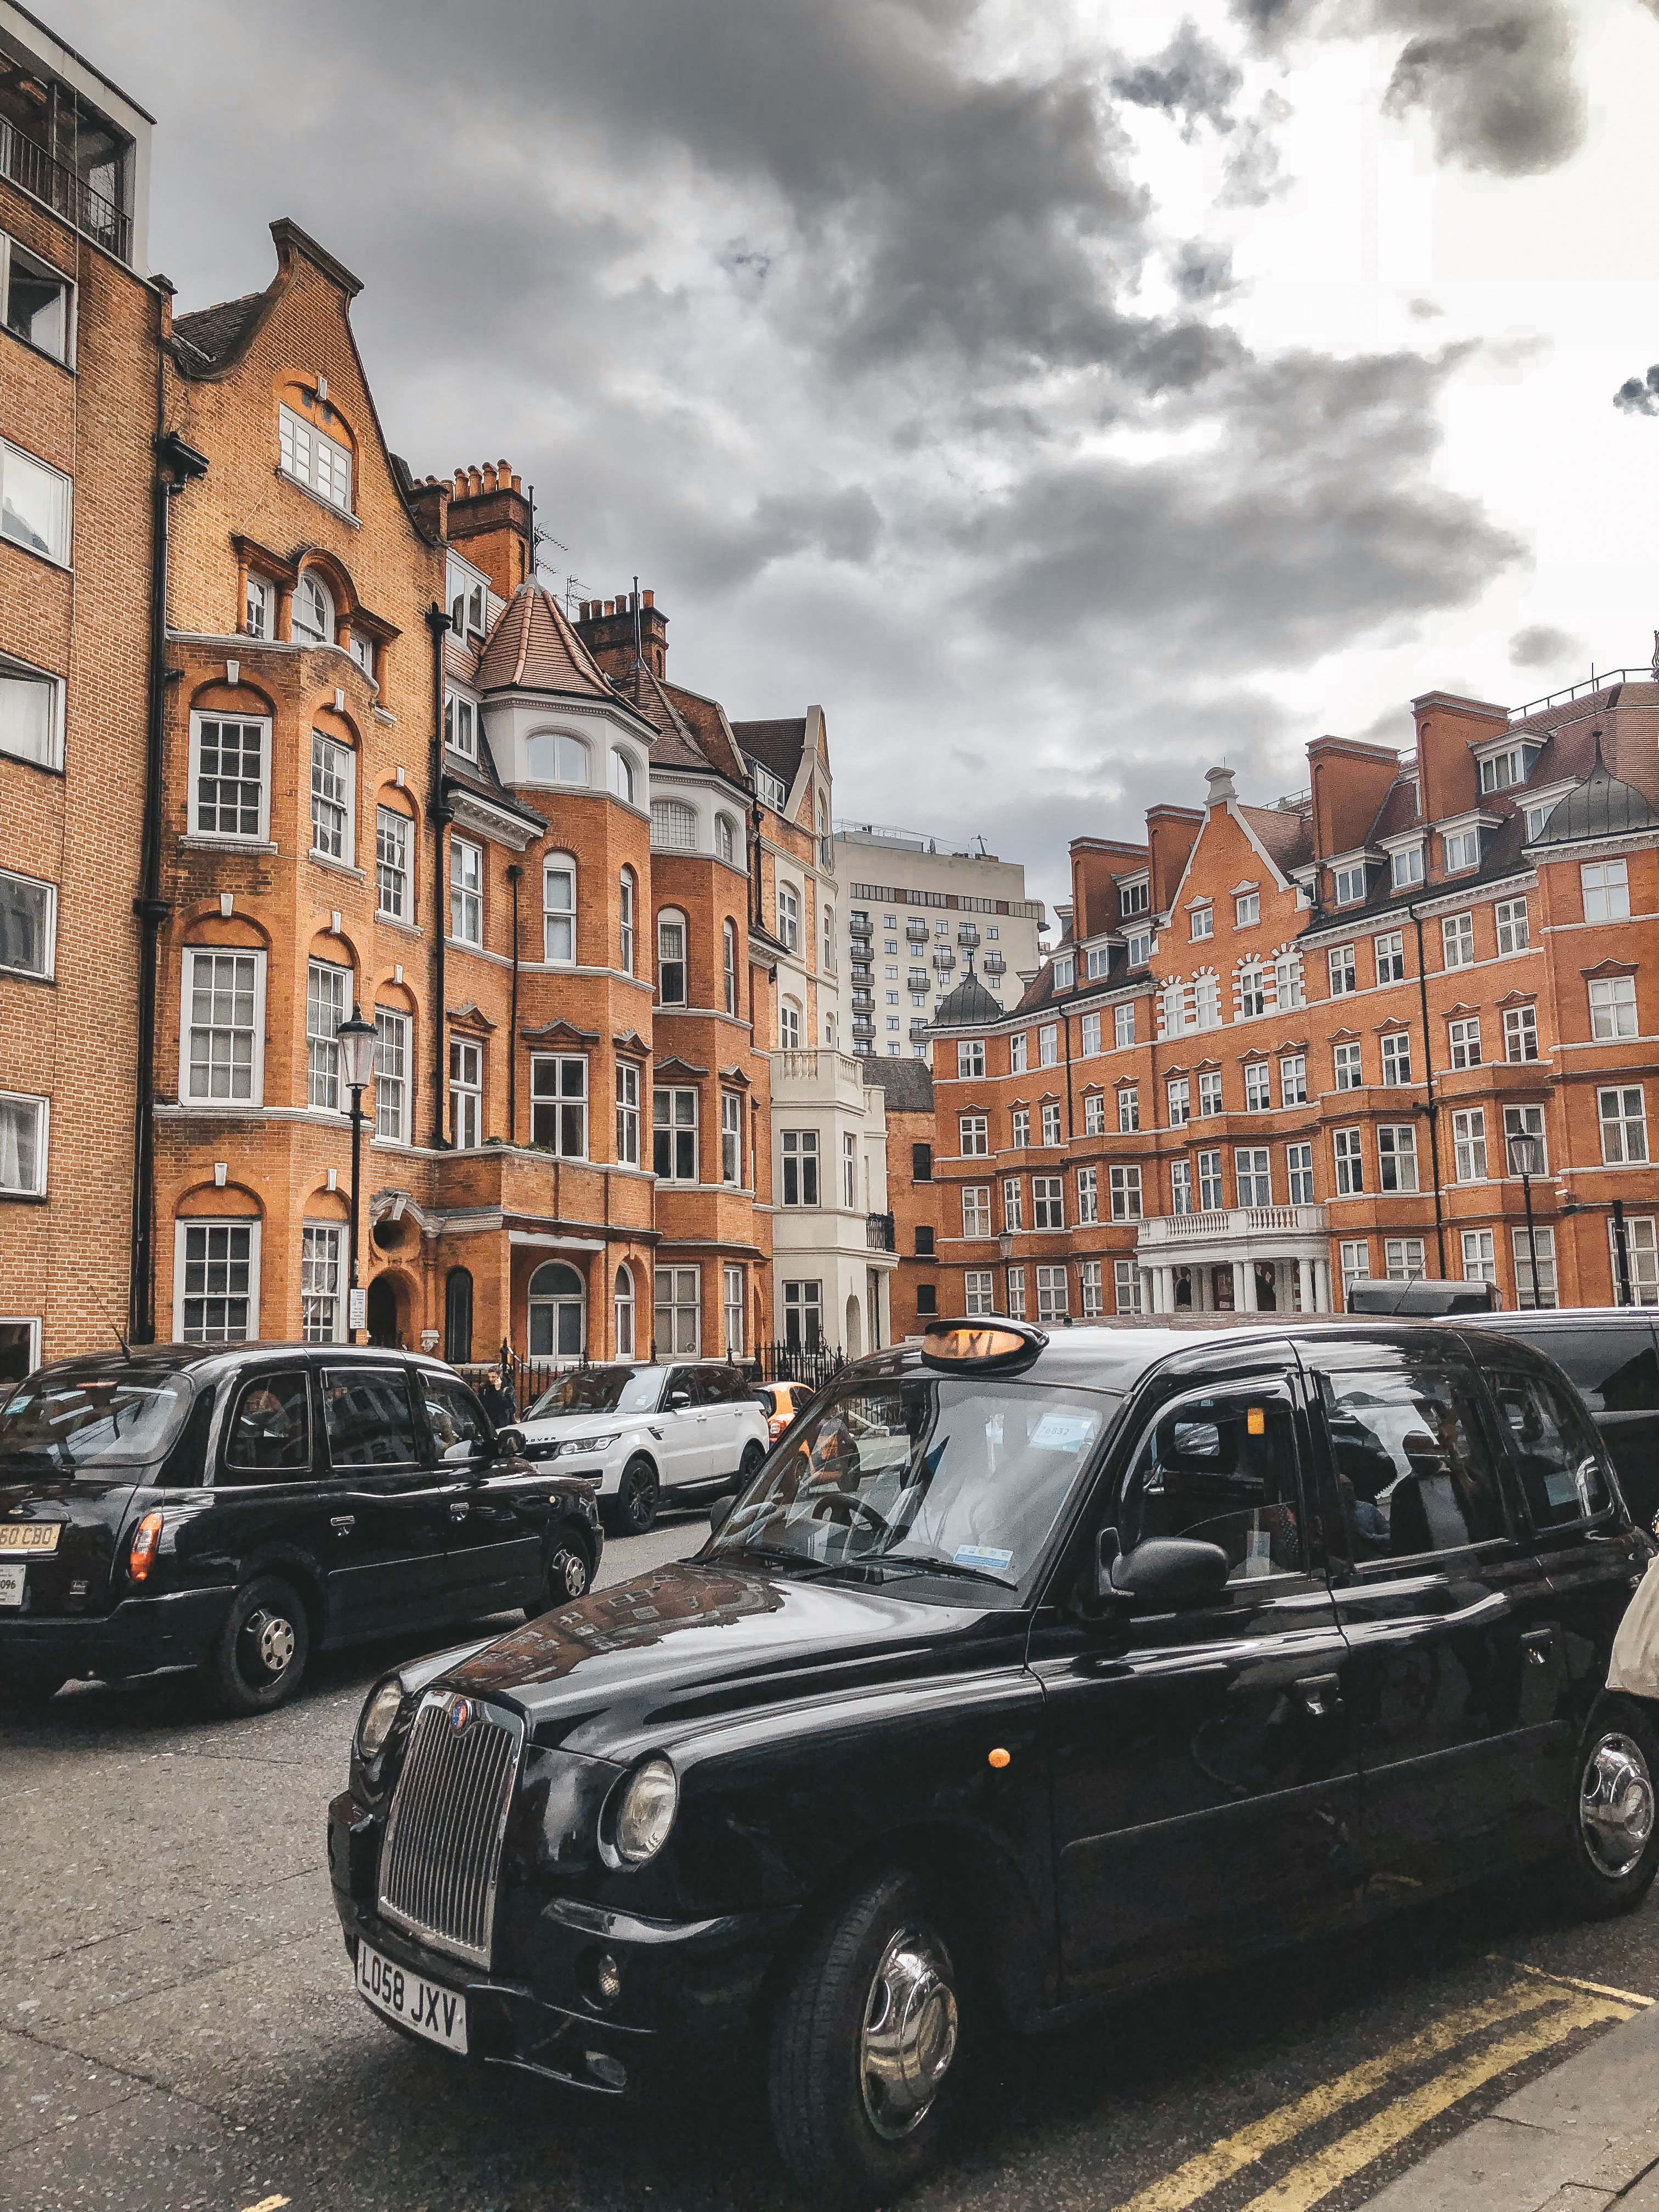 LONDON – DER 3 TAGE TRAVEL GUIDE